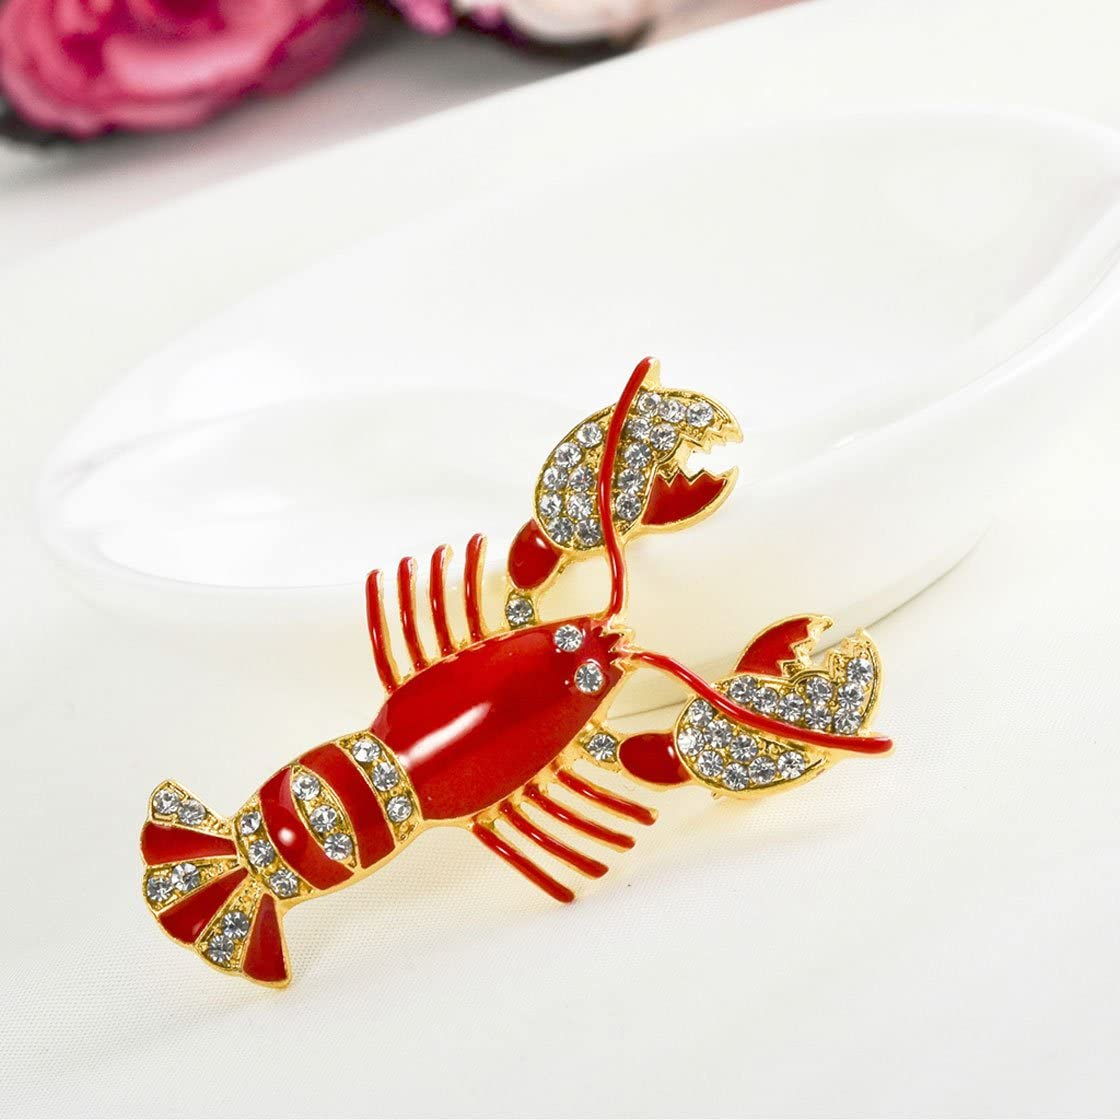 Zmdnys /® Women Lobster Brooch Jewelry Environmental Alloy Crystal Brooch Pins